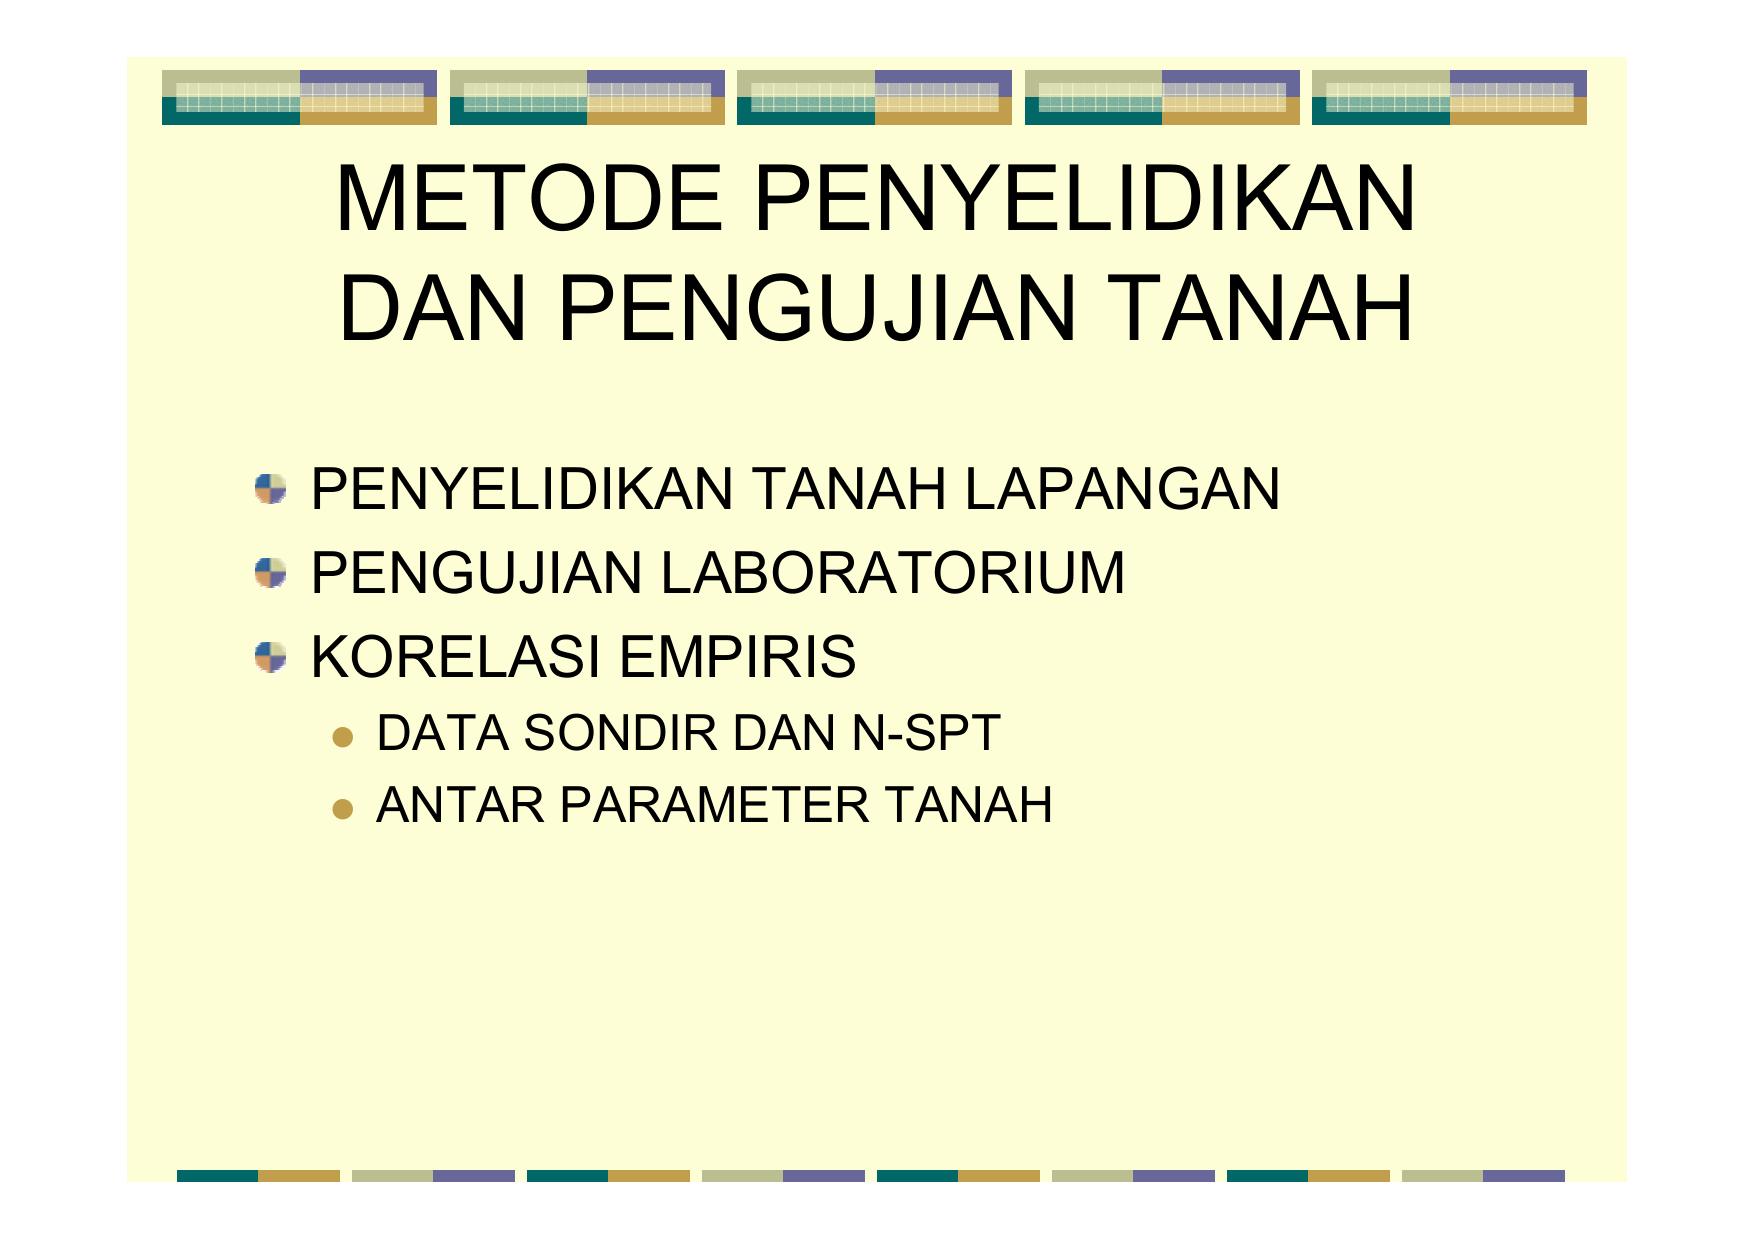 Metode Penyelidikan Dan Pengujian Tanah